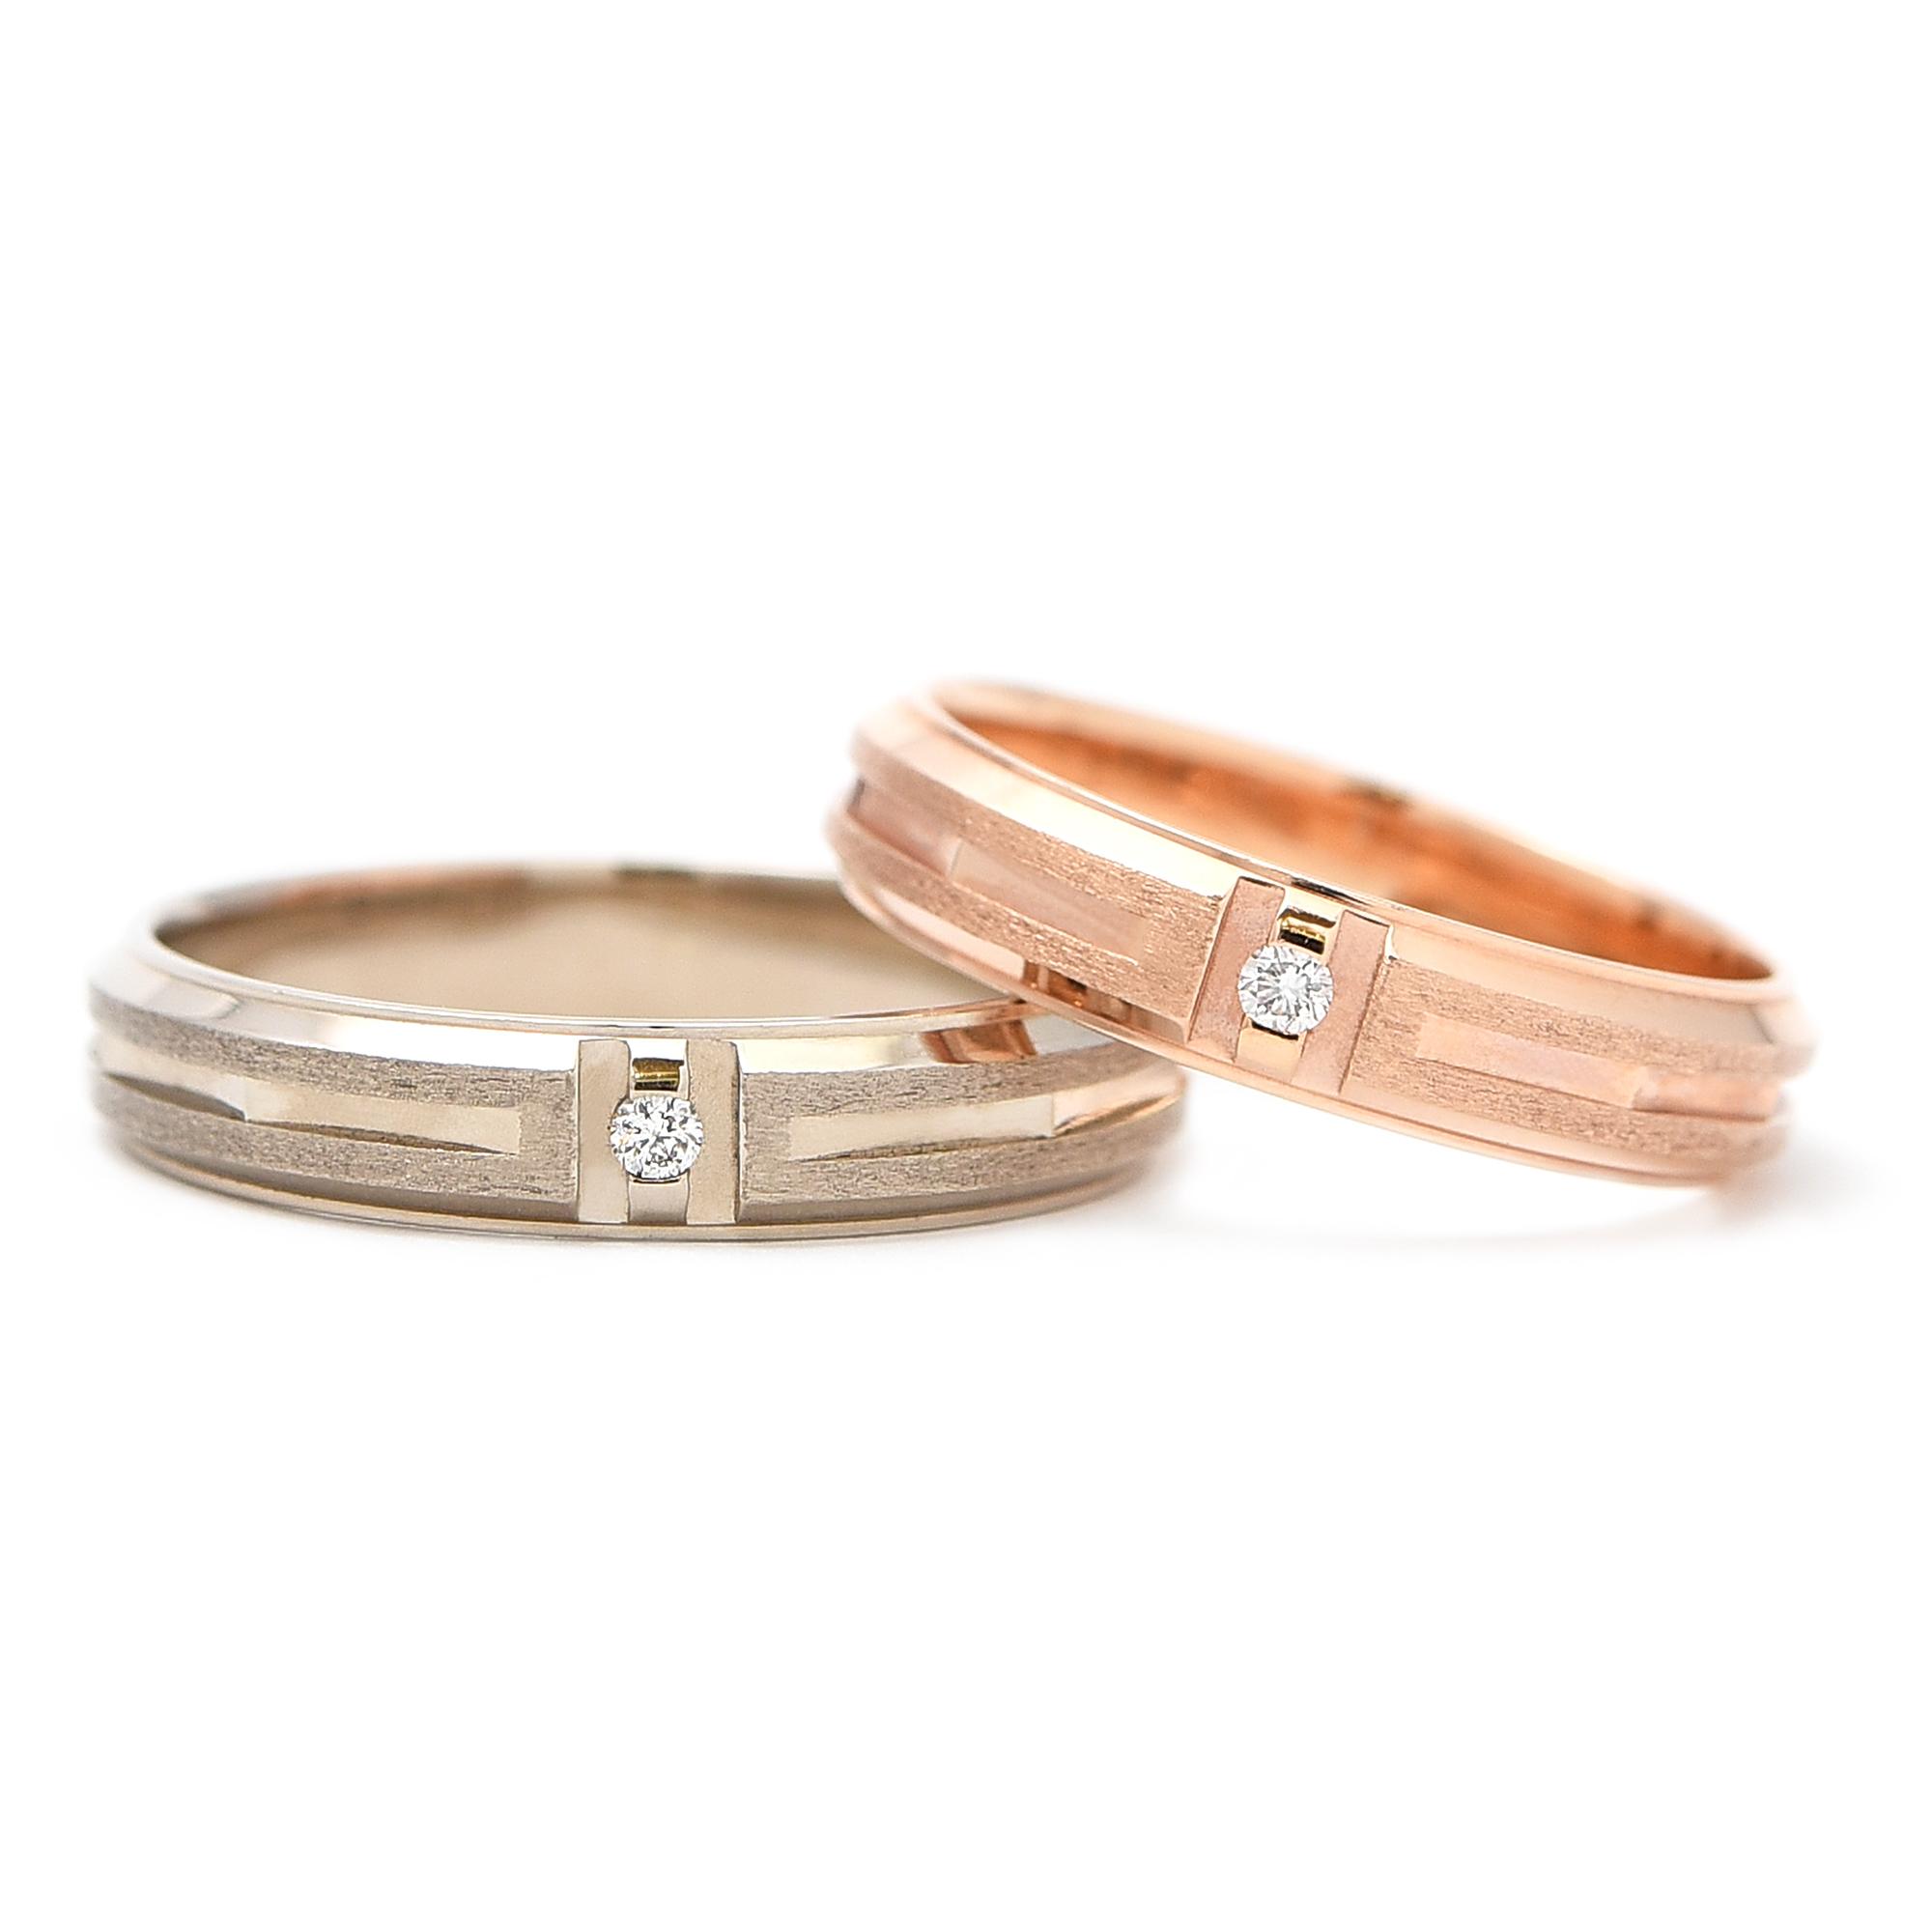 輪高崎工房の結婚指輪|HR-281